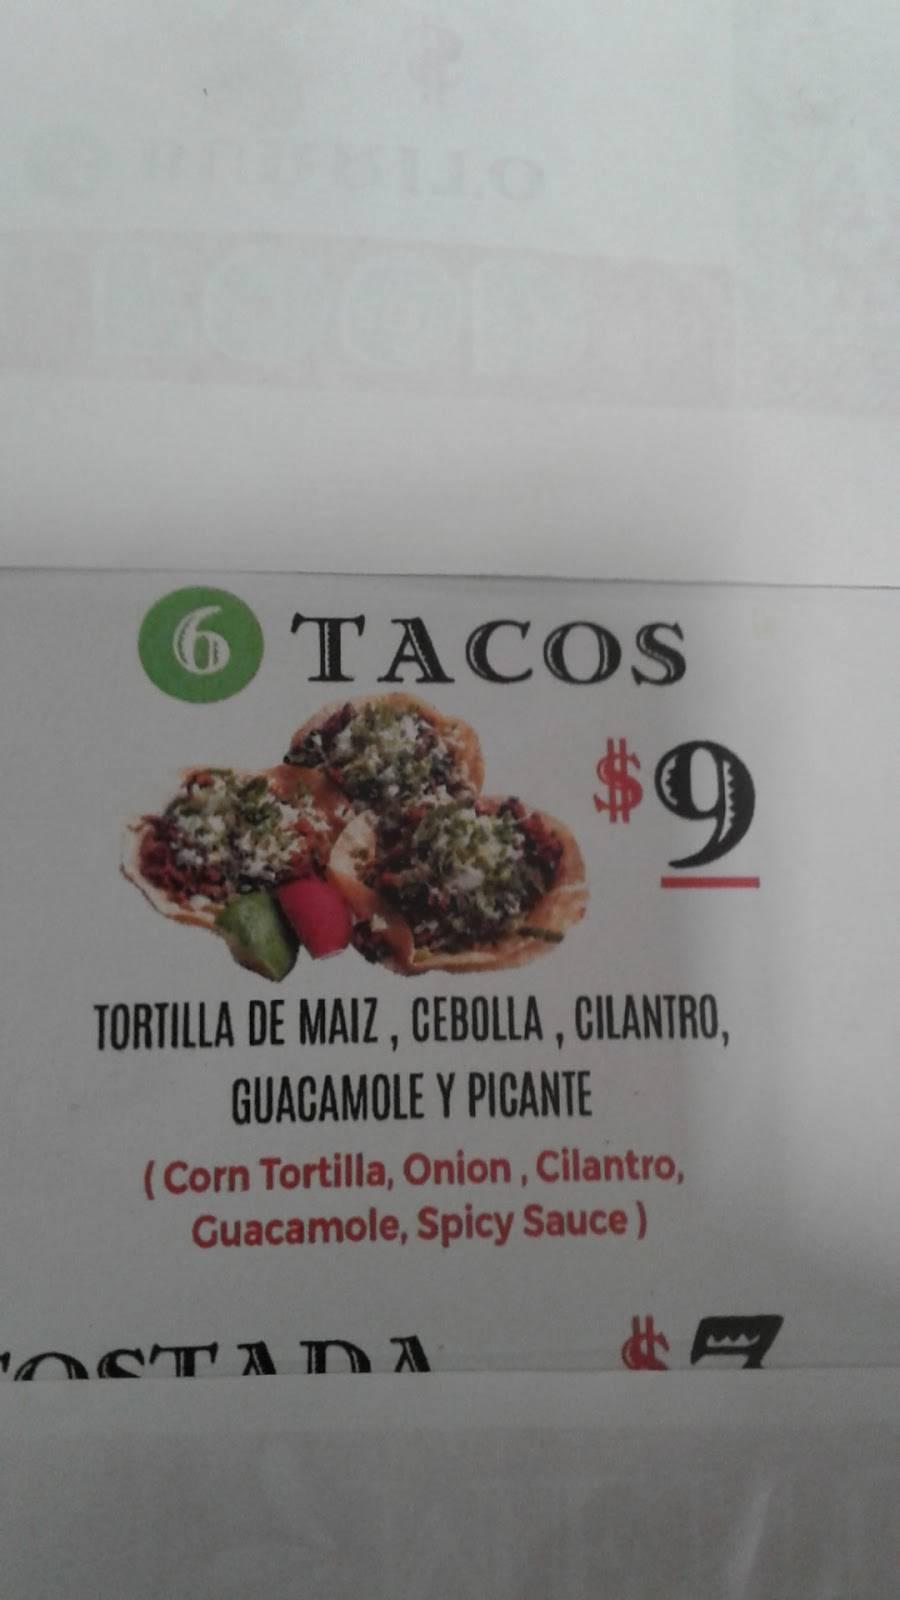 The Boss Of The Taco | restaurant | 47-7 Broadway, Astoria, NY 11103, USA | 9292300976 OR +1 929-230-0976